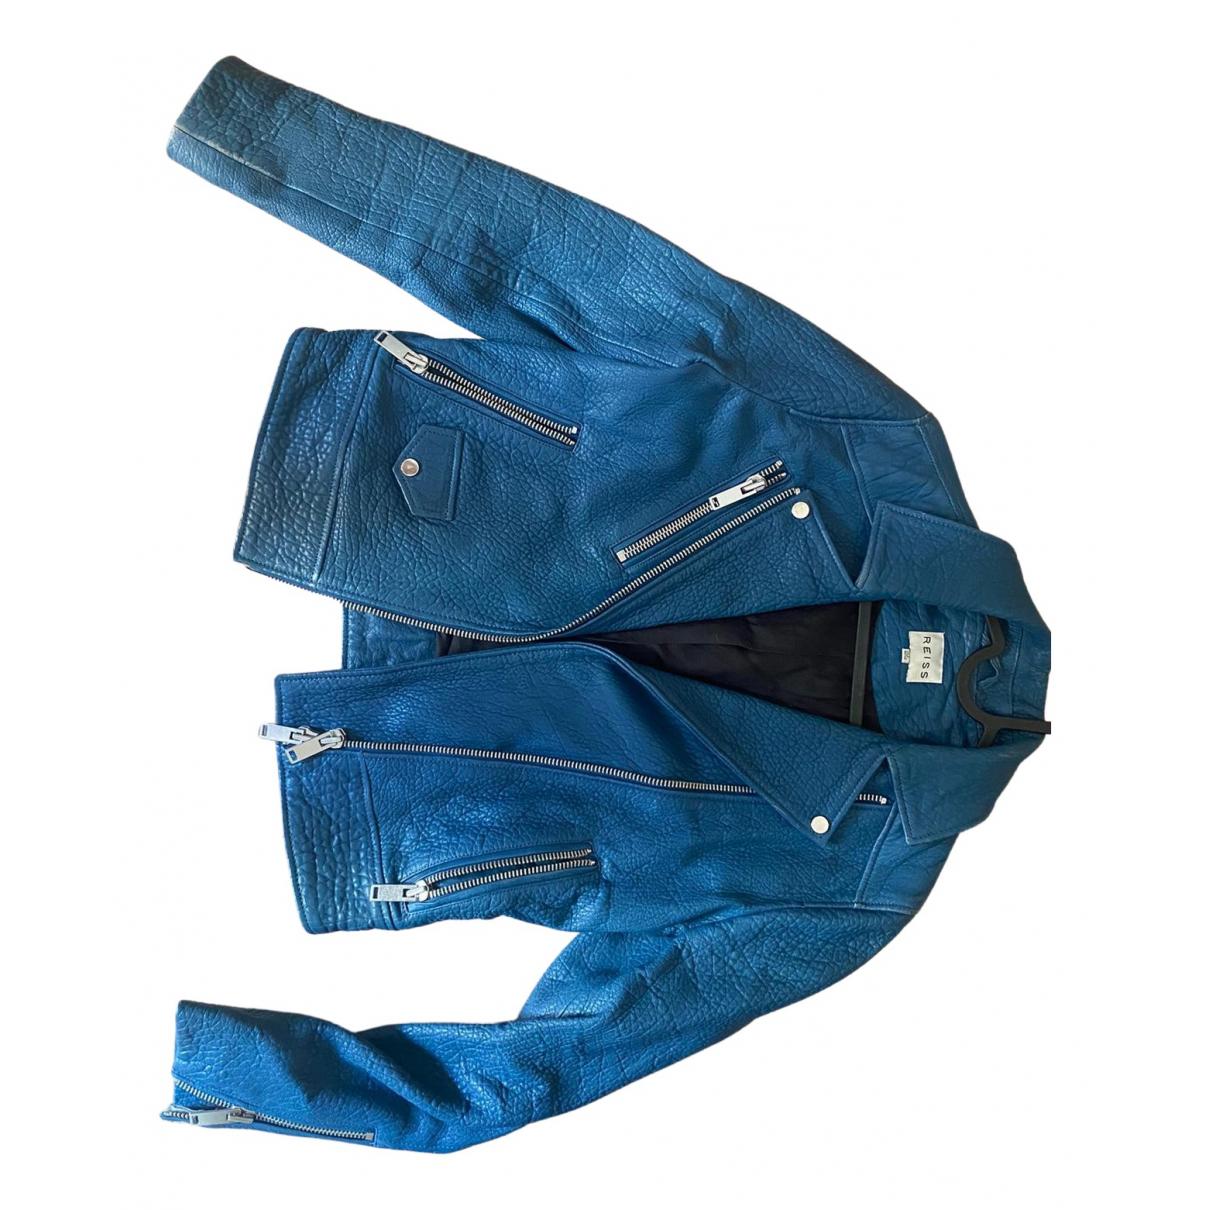 Reiss \N Blue Leather jacket for Women 34 FR